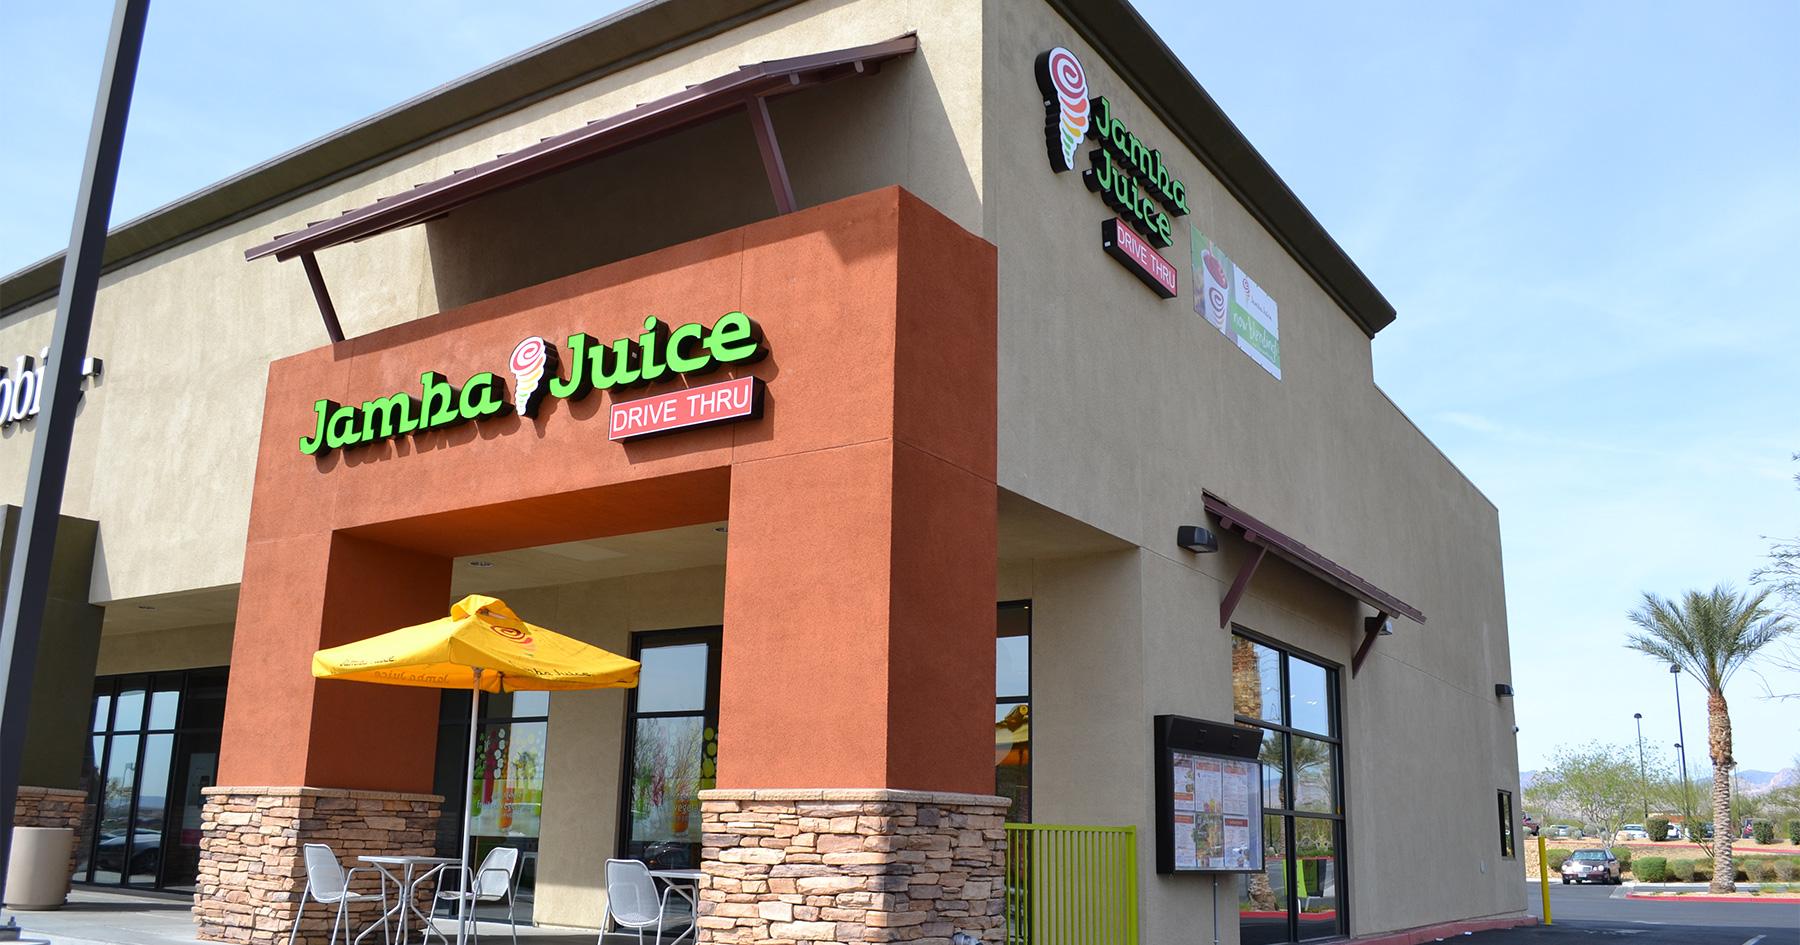 Drive Thrus Are Cornerstone Of Jamba Juice S Growth Plans